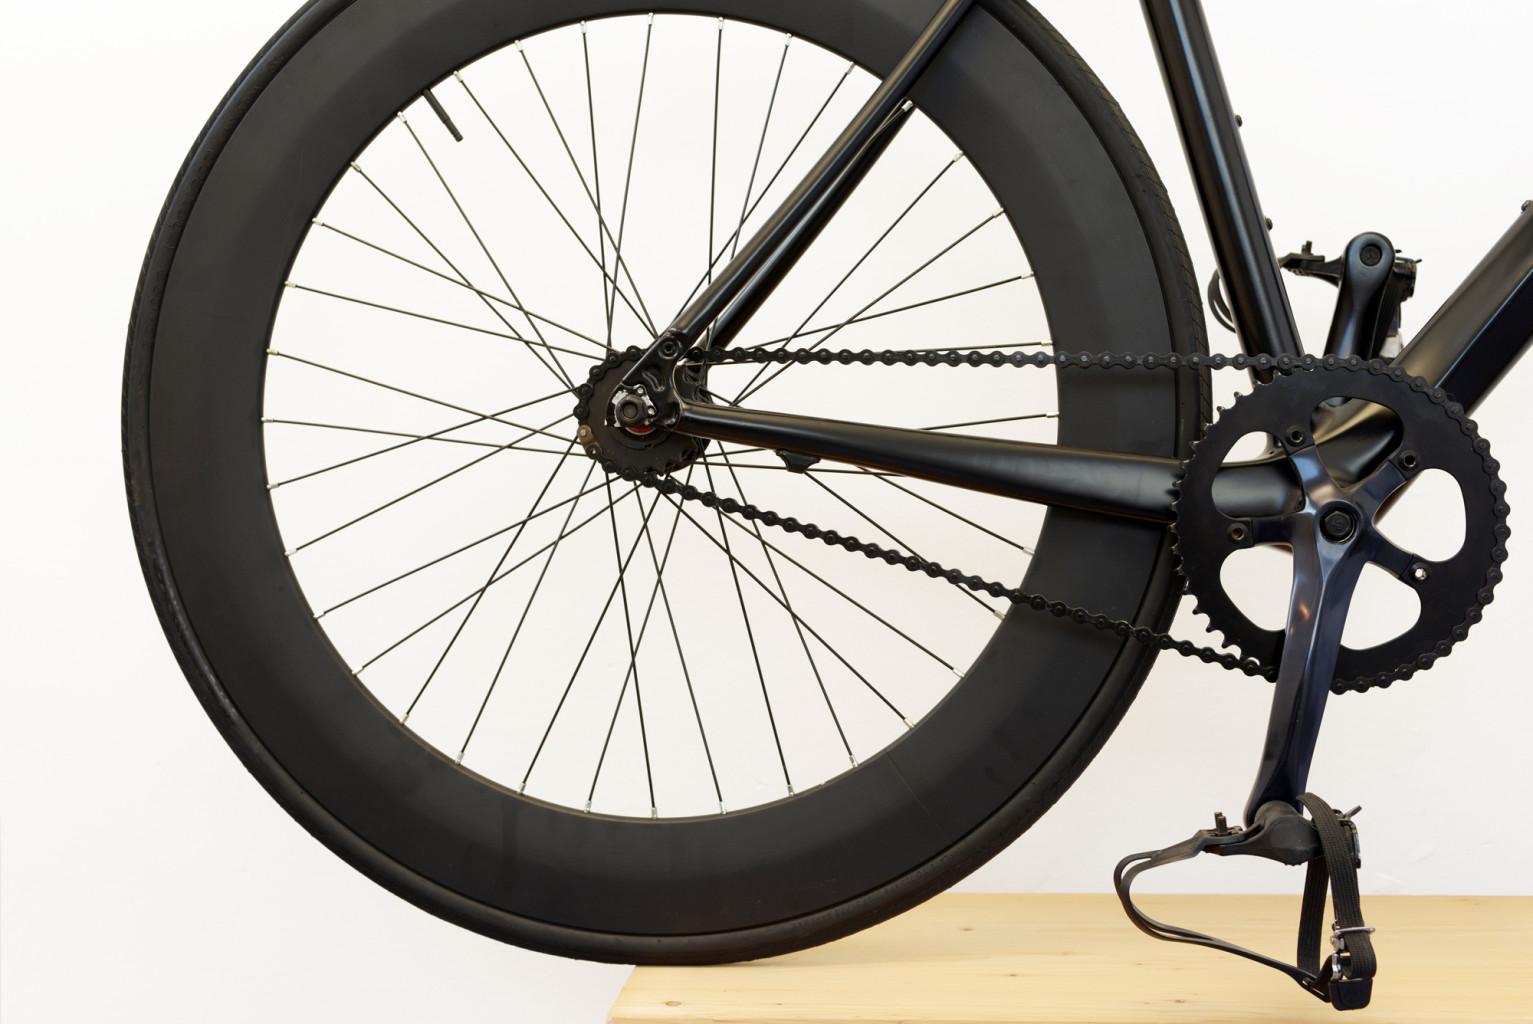 Bespoke bike 23